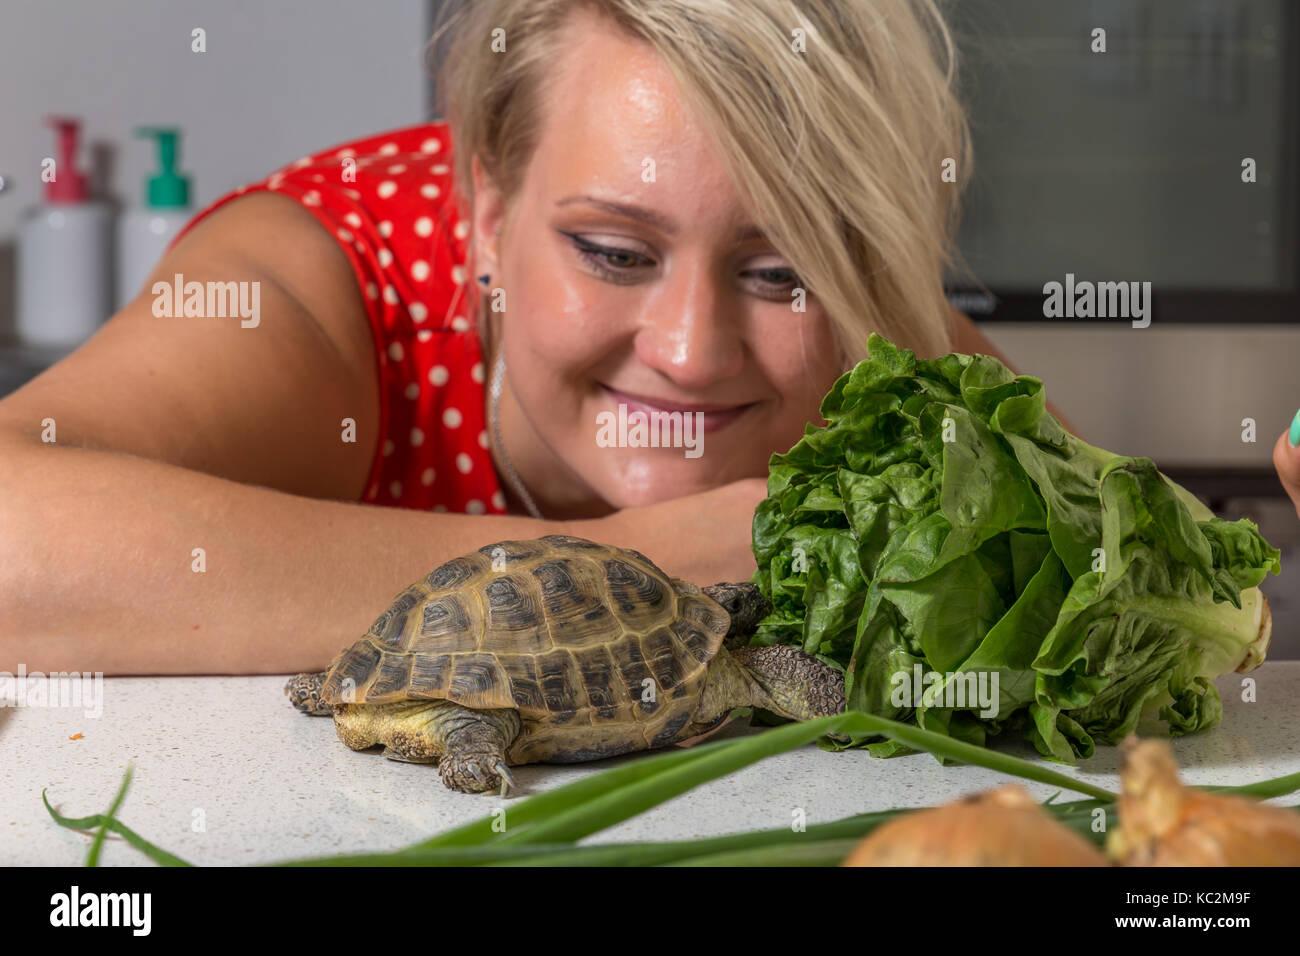 roman tortoise stockfotos roman tortoise bilder alamy. Black Bedroom Furniture Sets. Home Design Ideas